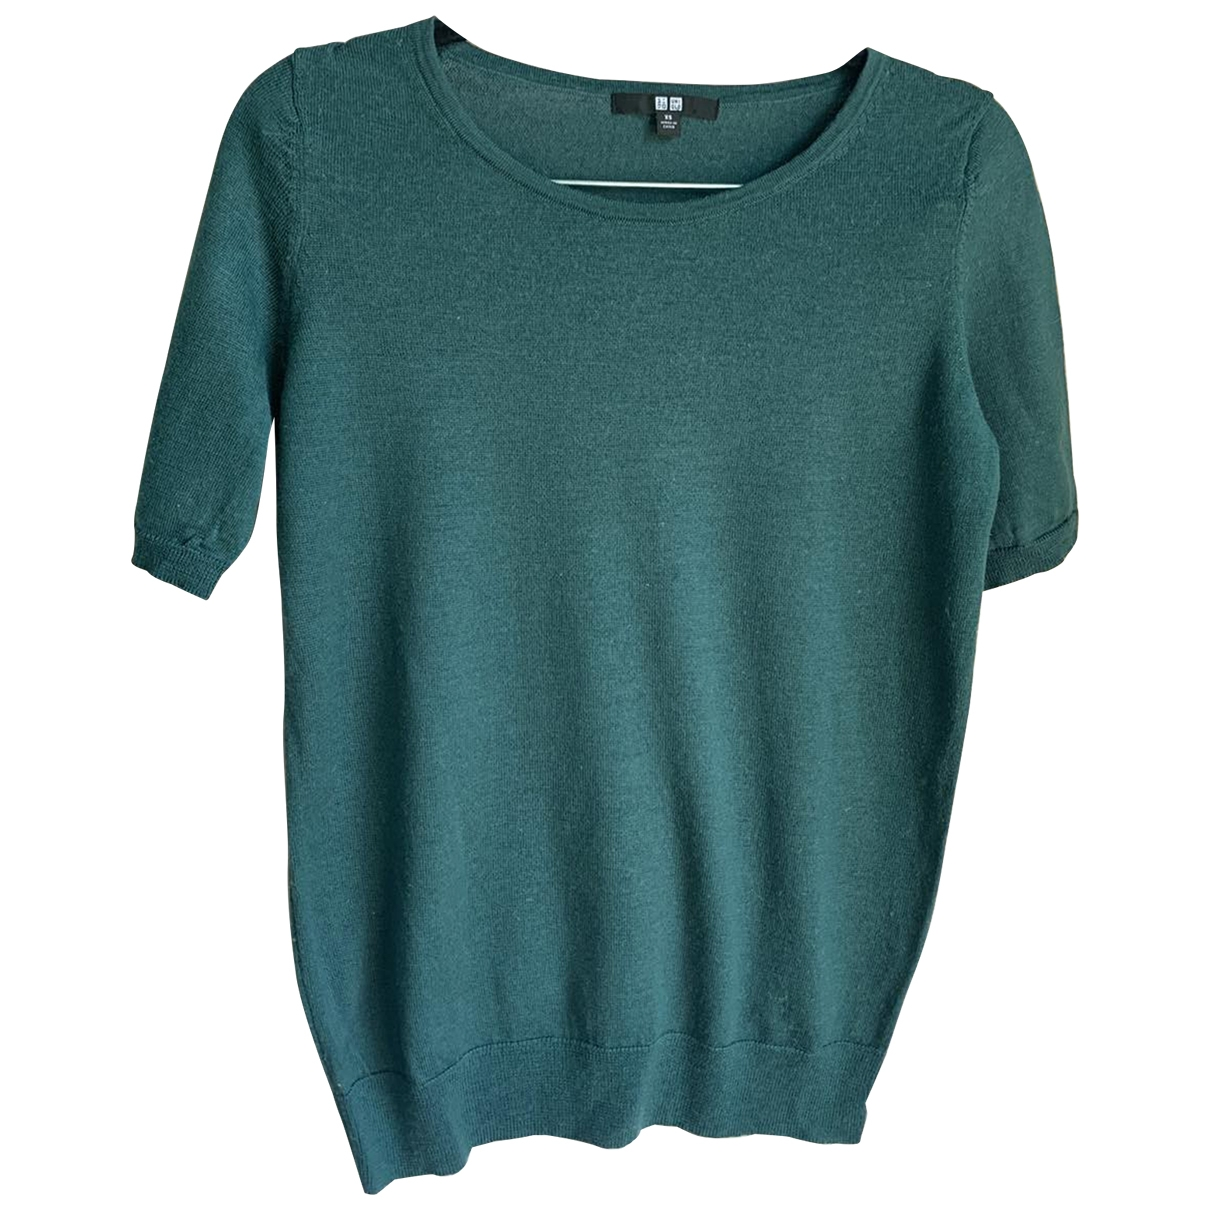 Camiseta de Lana Uniqlo